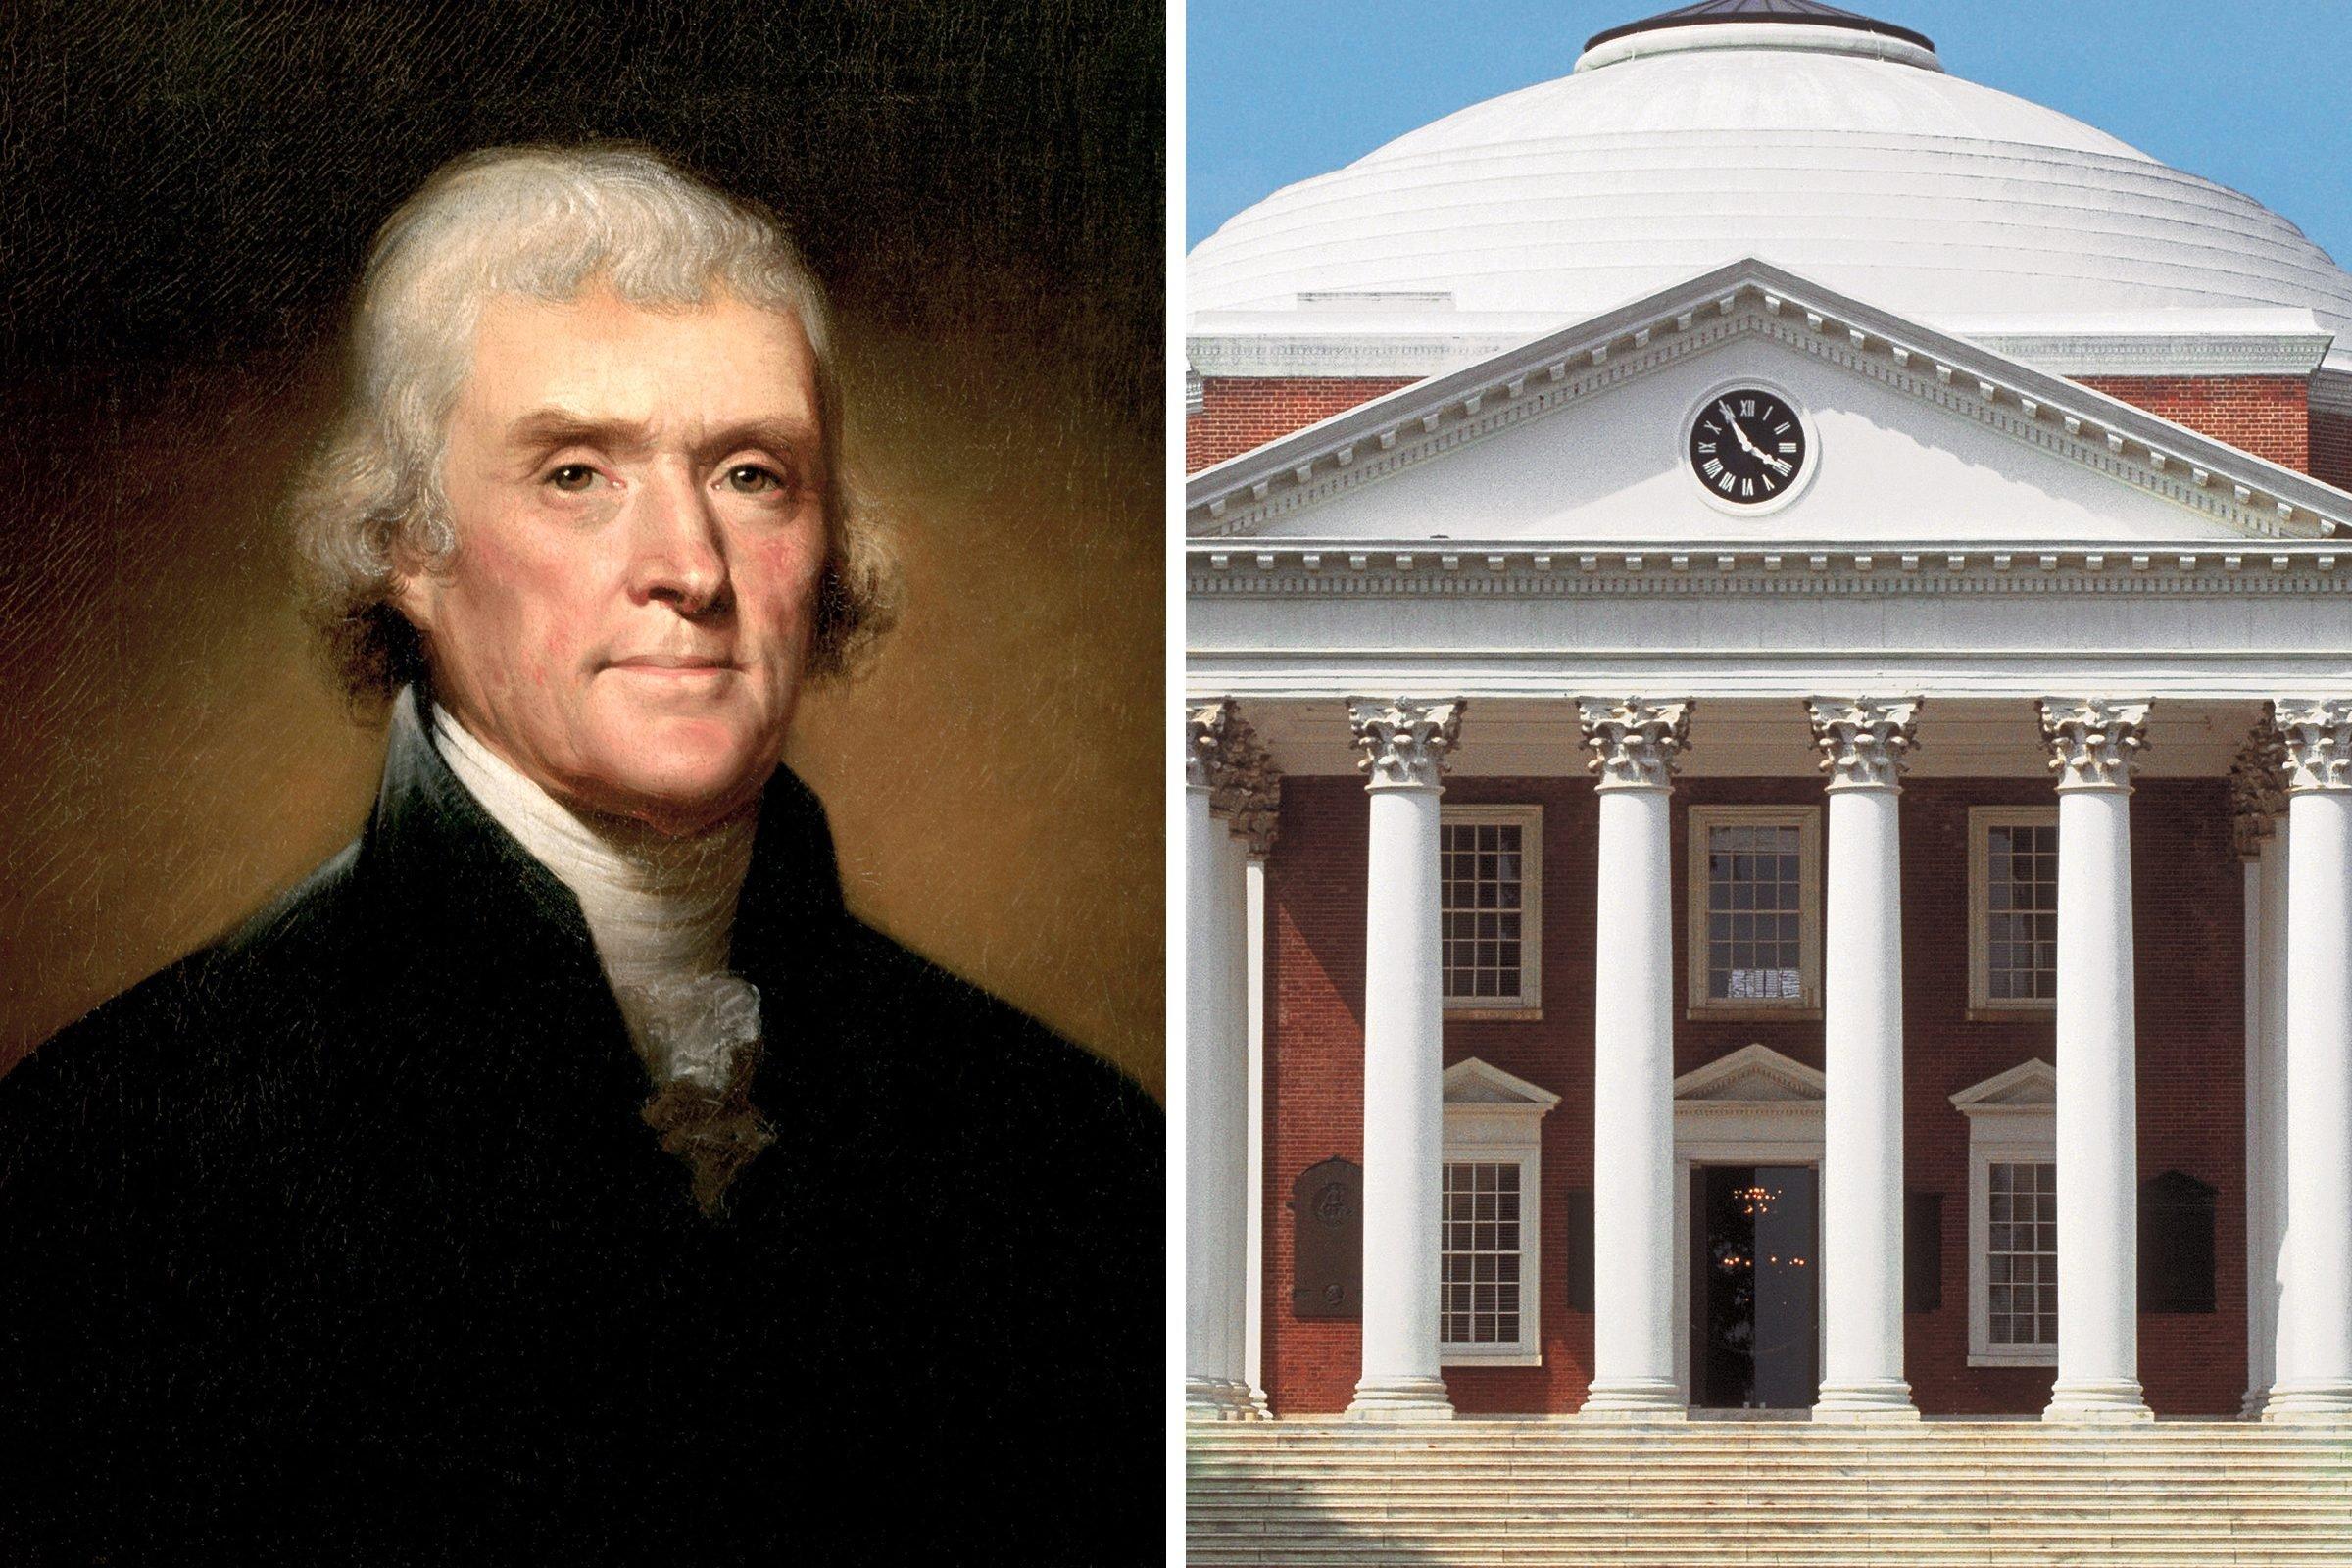 Thomas Jefferson: University founder